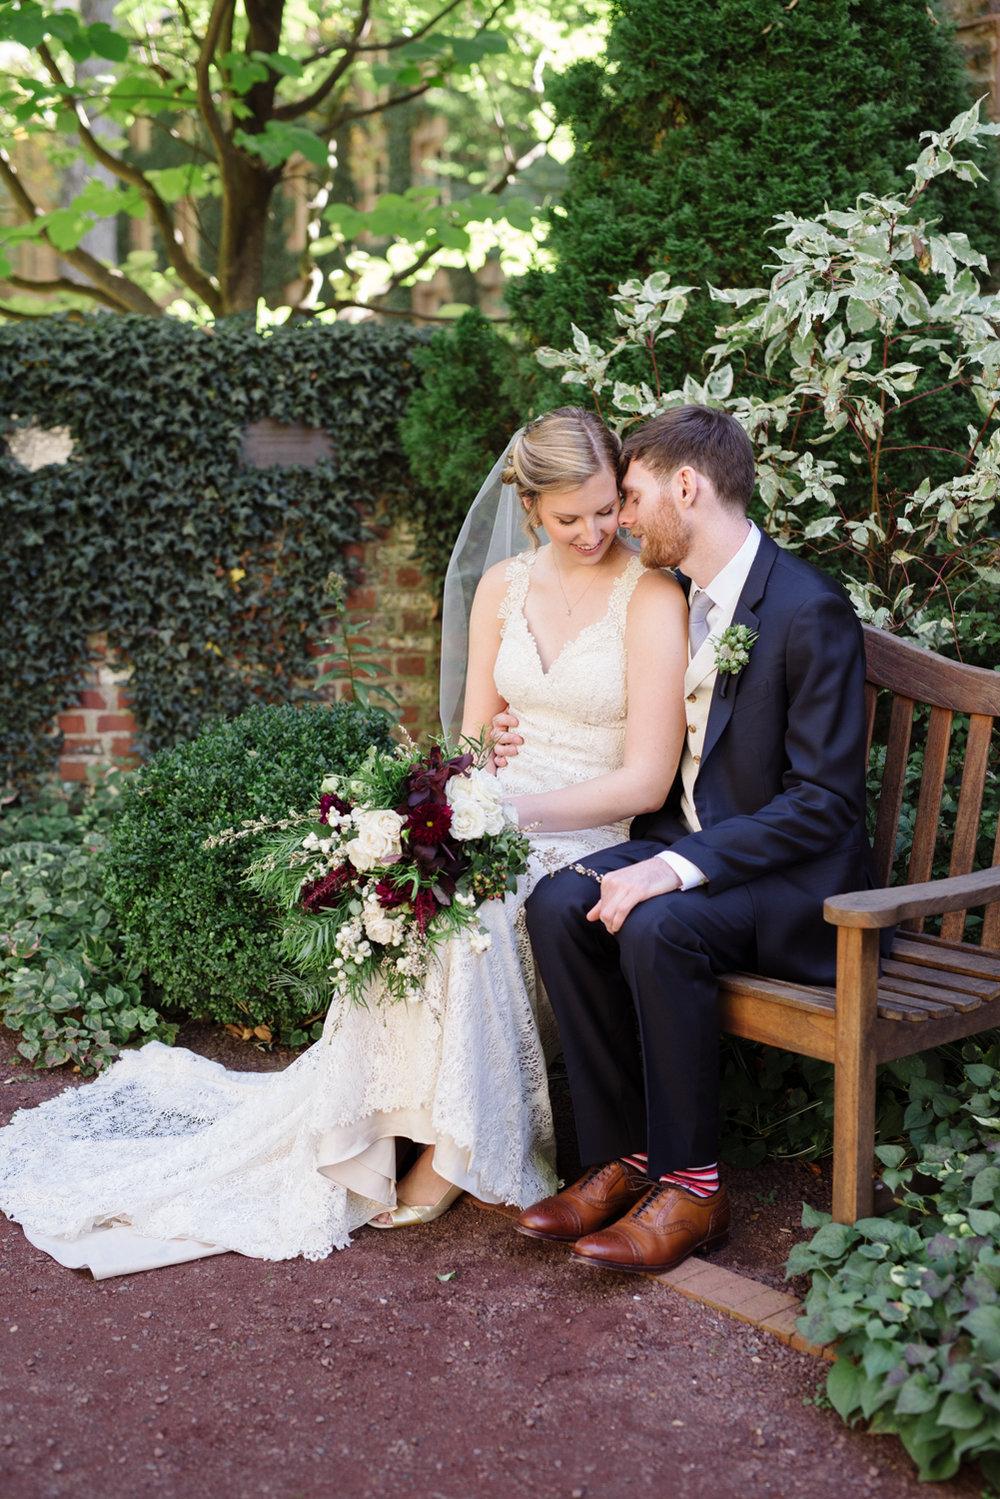 Chelsea+James-Triumph Brewery Wedding- Princeton- New Jersey- Olivia Christina Photo-1.JPG